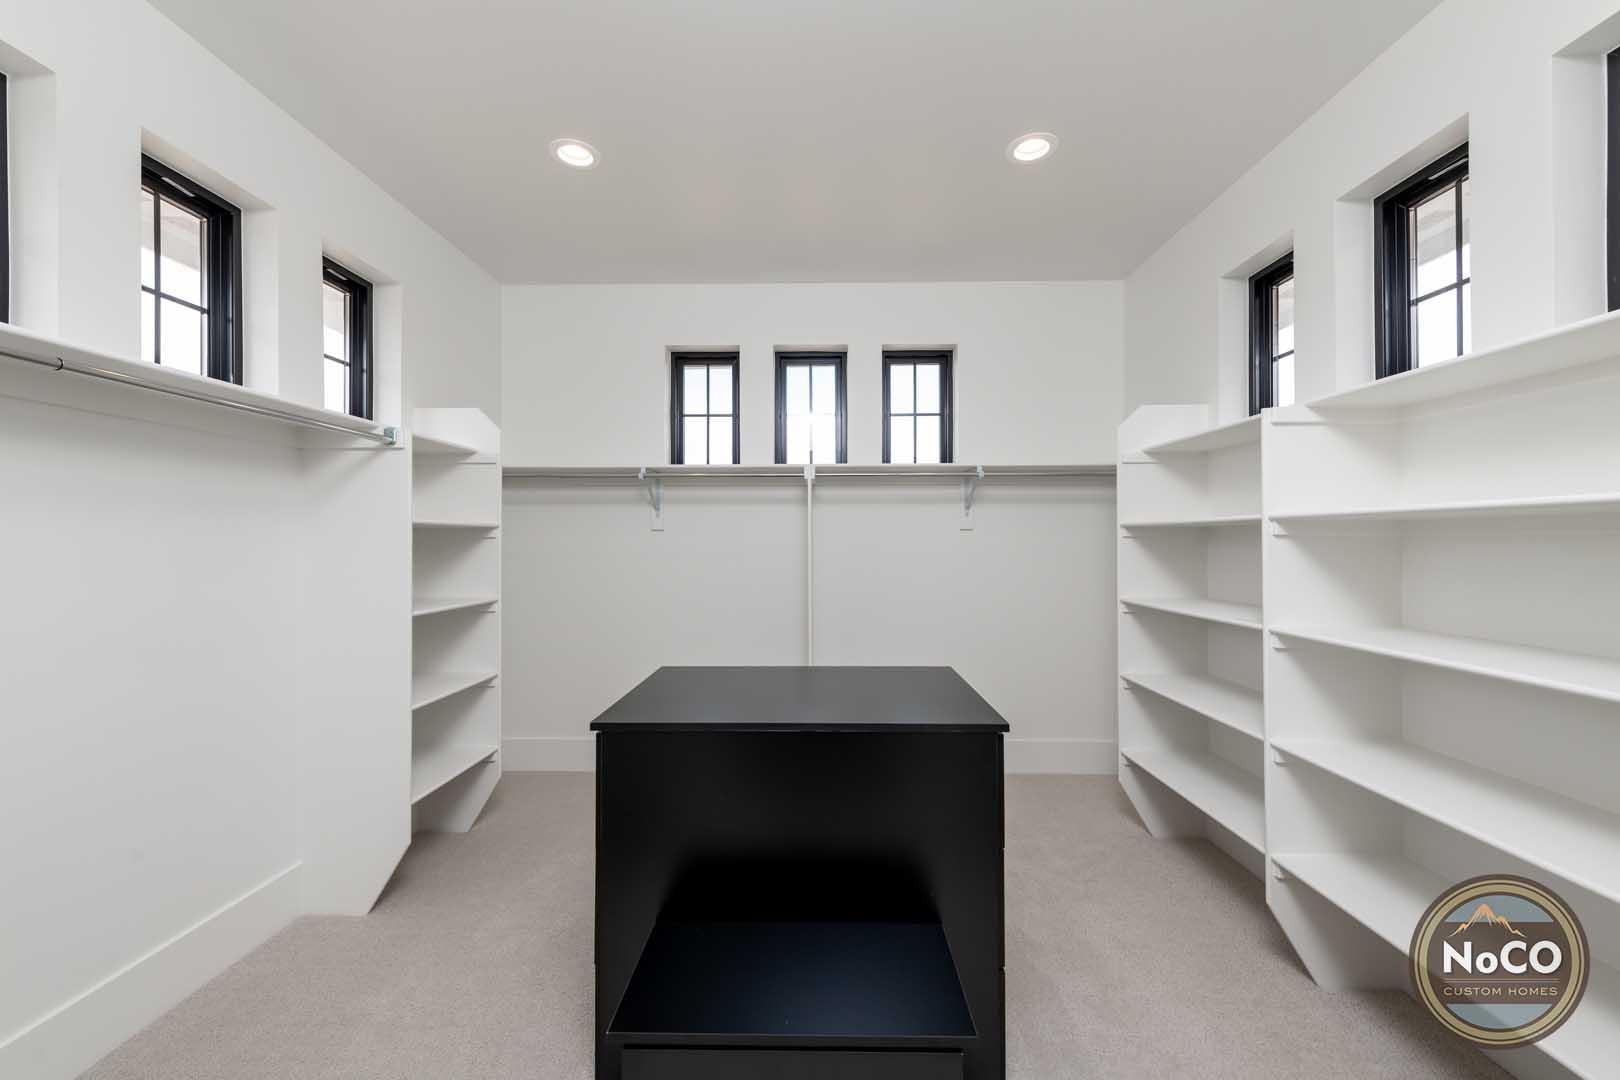 colorado custom home walk-in closet